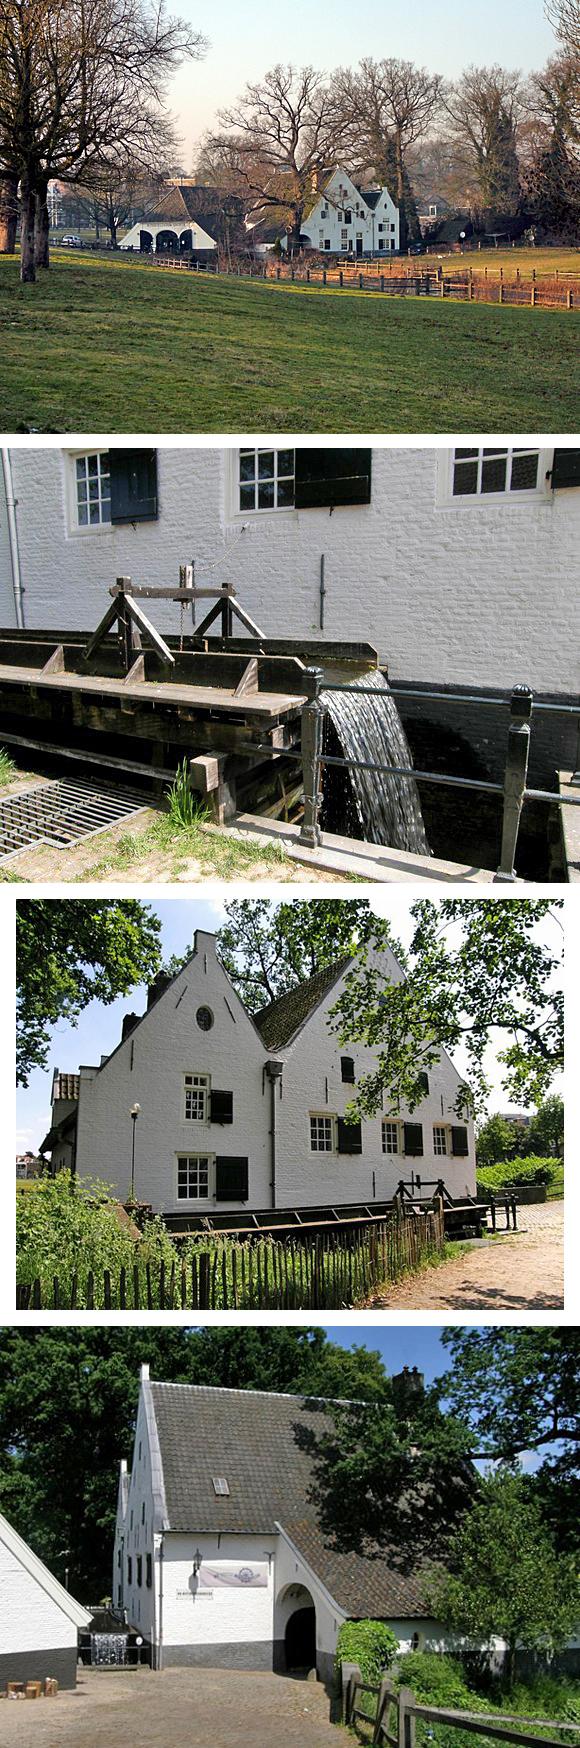 De Witte Molen, Arnhem, boven Dick Bunskoeke (29-01-2011) en Loek Busser(15-5-2008)   Database Nederlandse molens